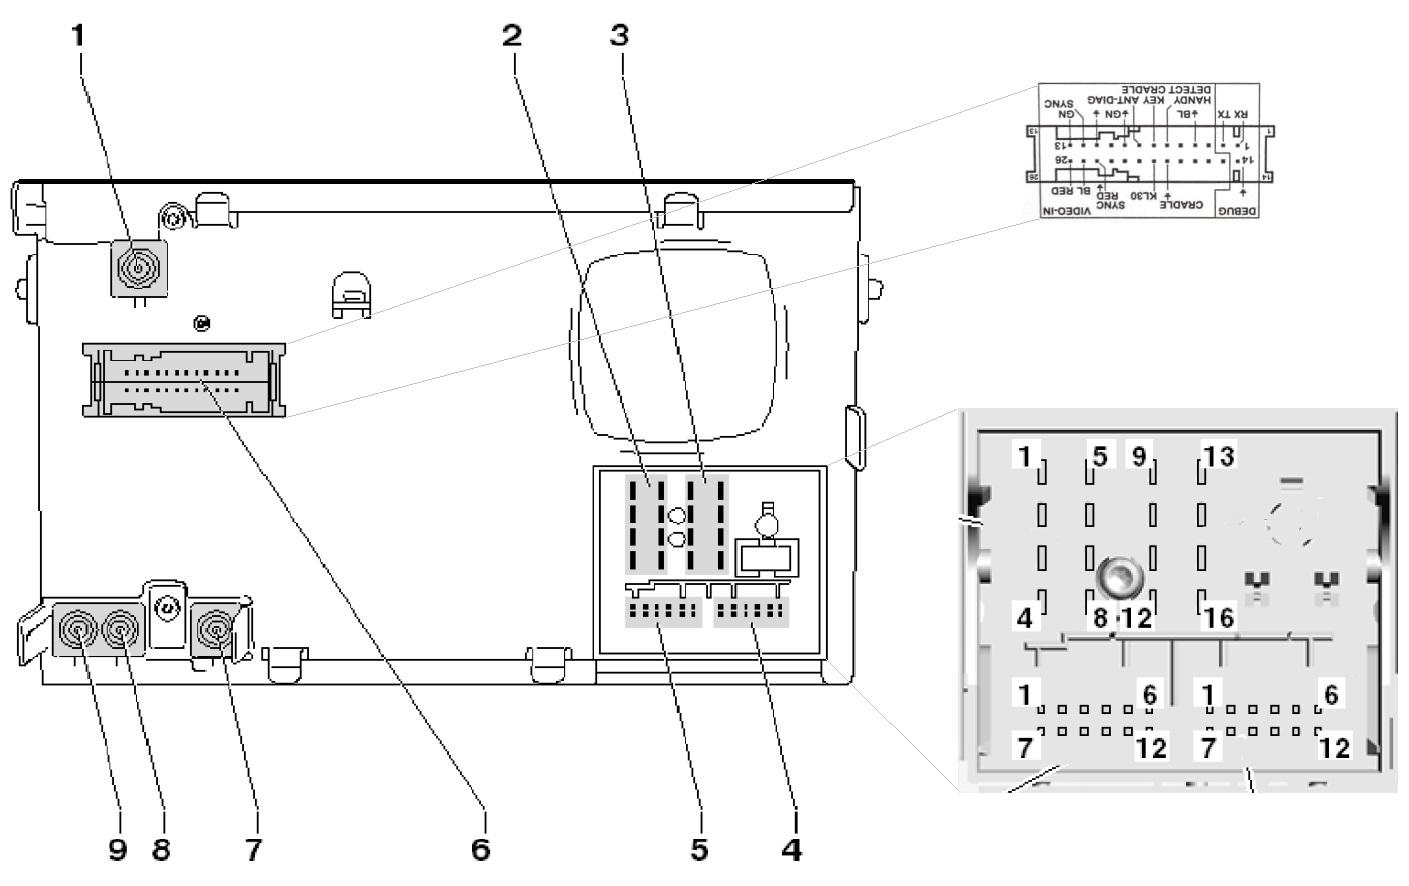 rcd 310 wiring diagram